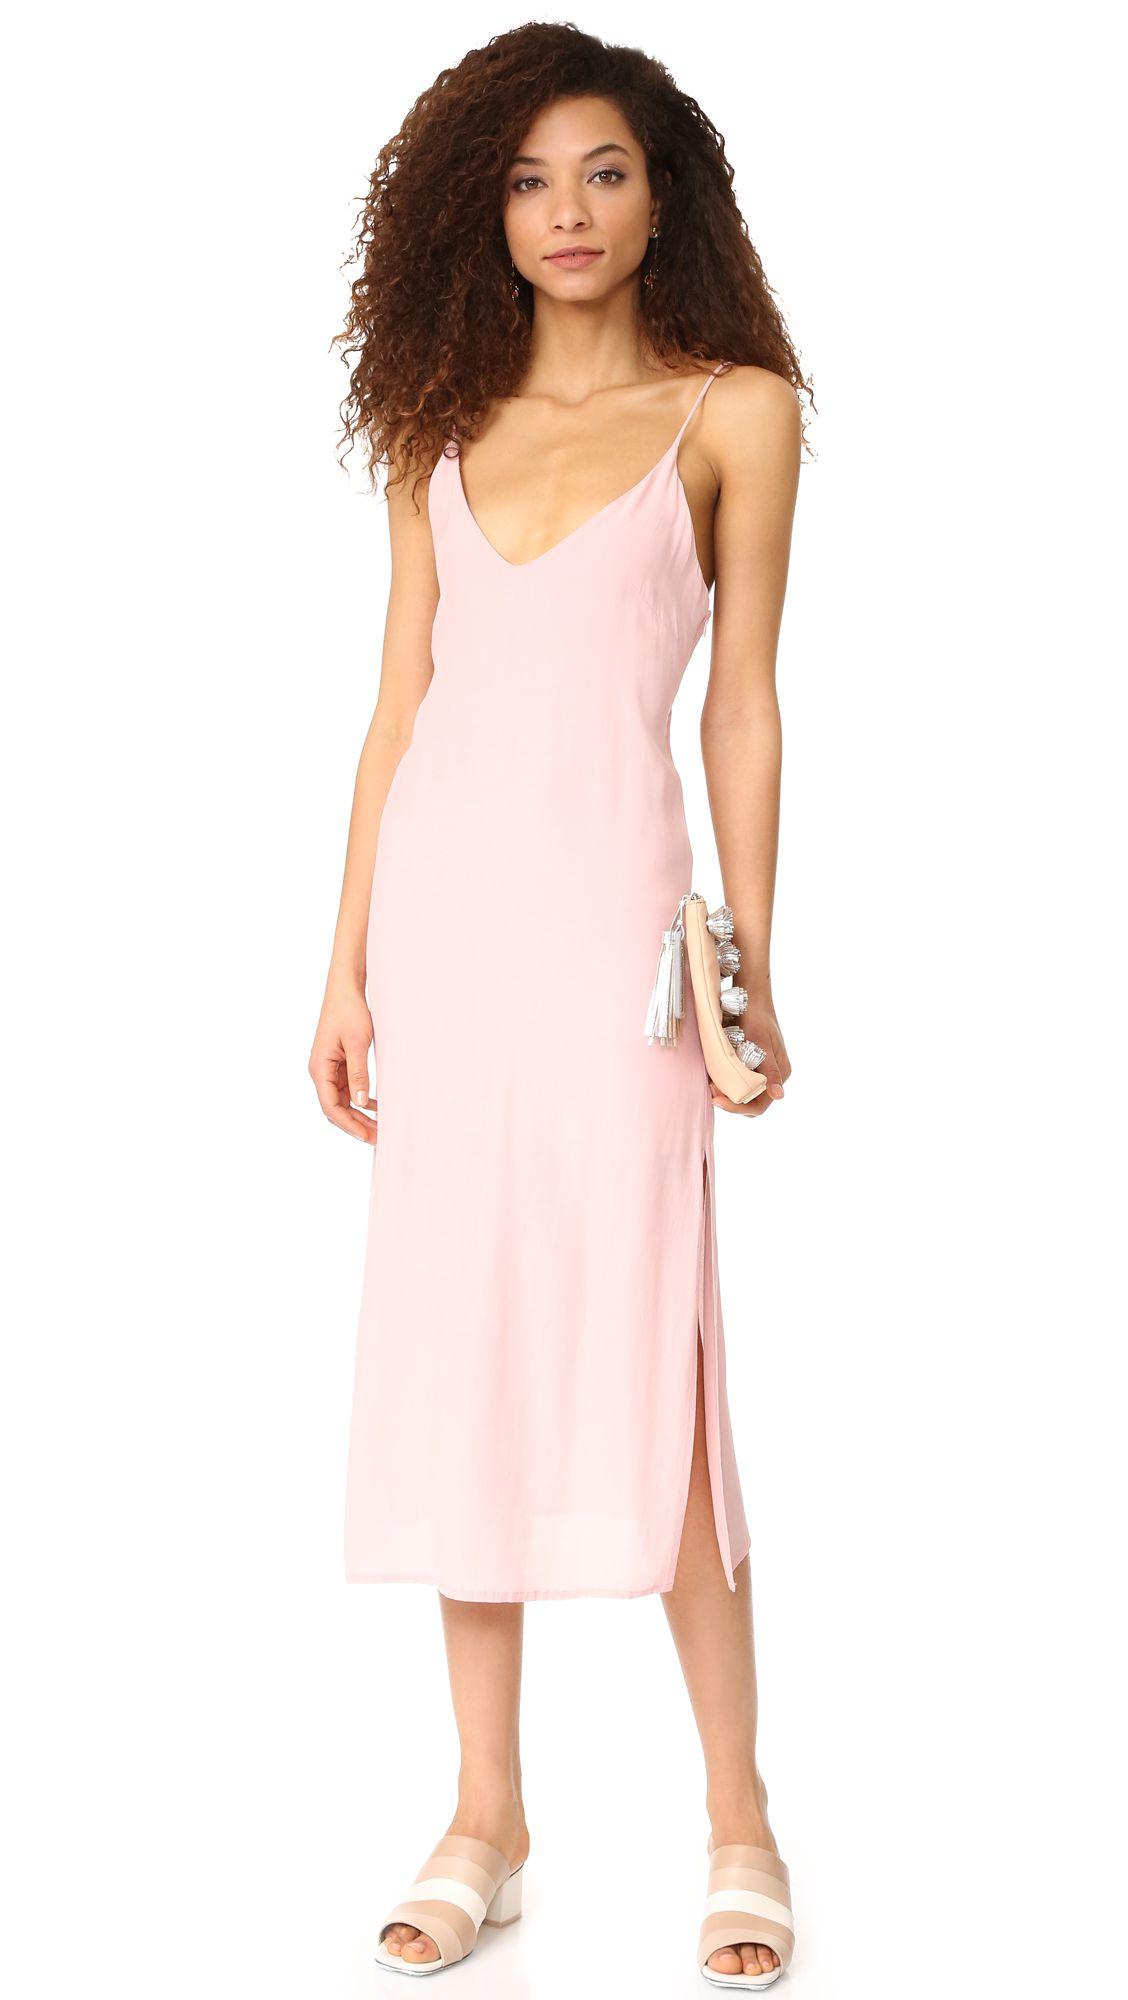 A model in a pink slip dress